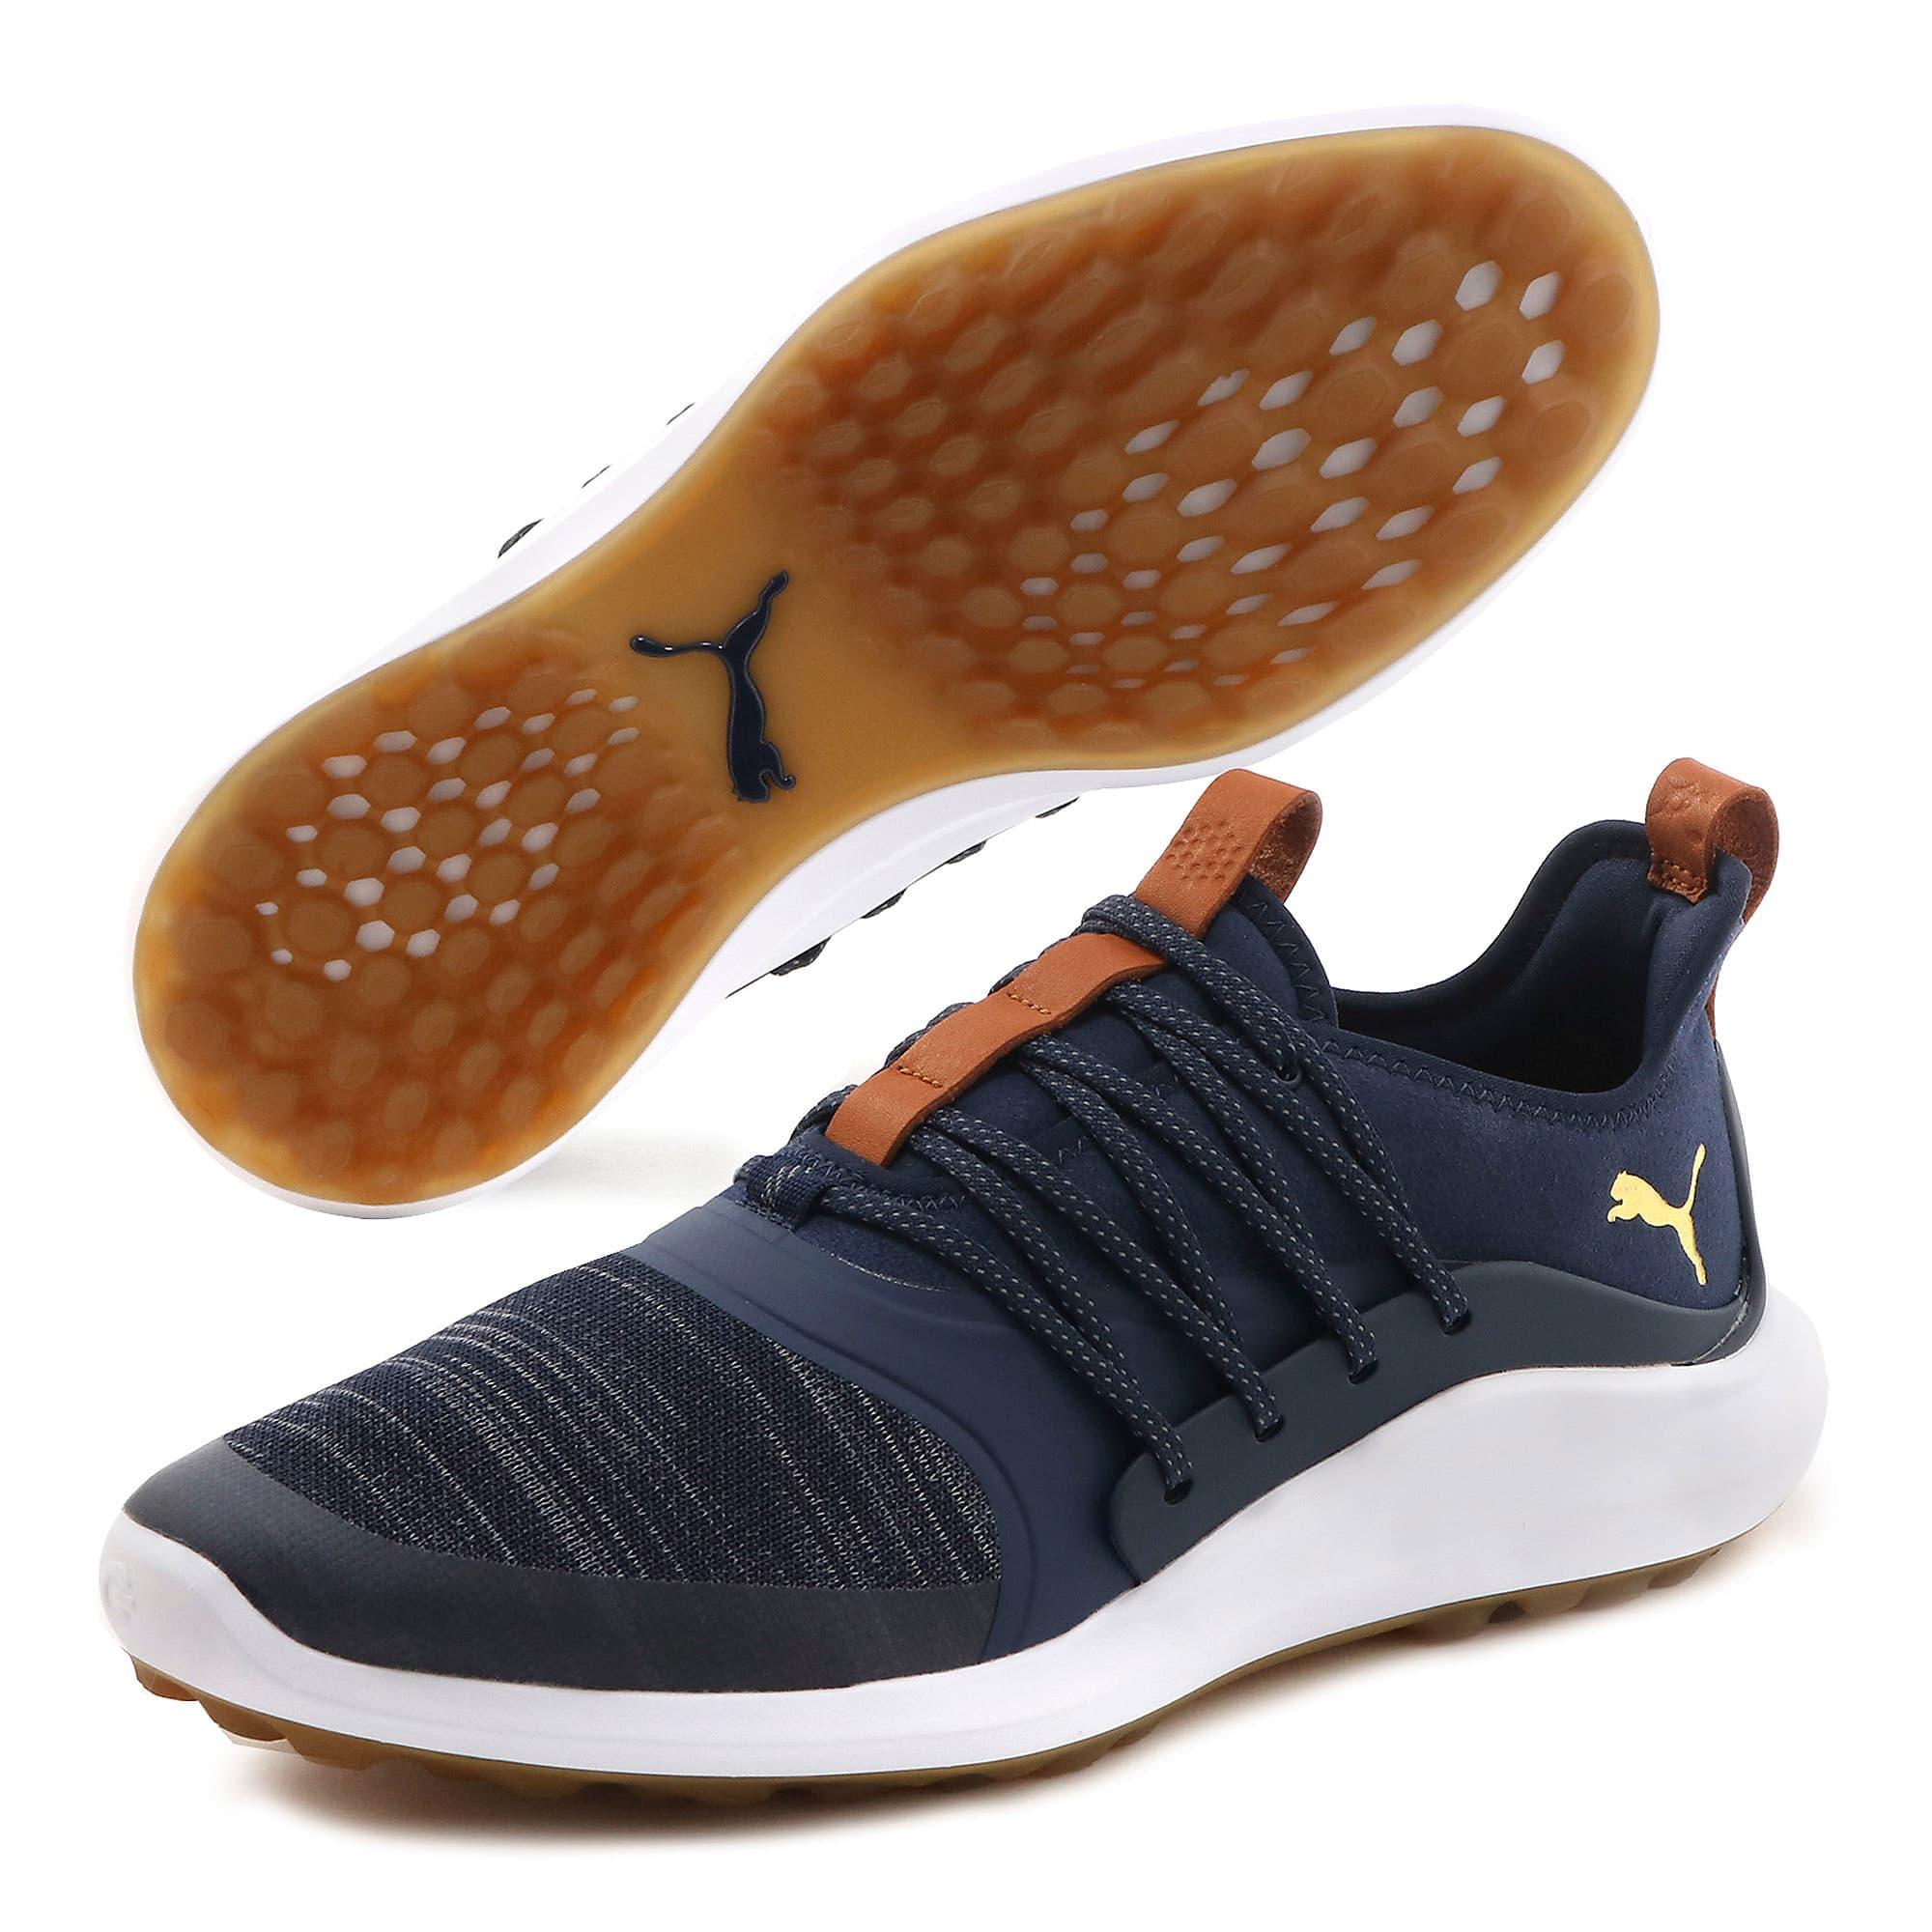 Thumbnail 2 of IGNITE NXT SOLELACE Men's Golf Shoes, Peacoat-Gold, medium